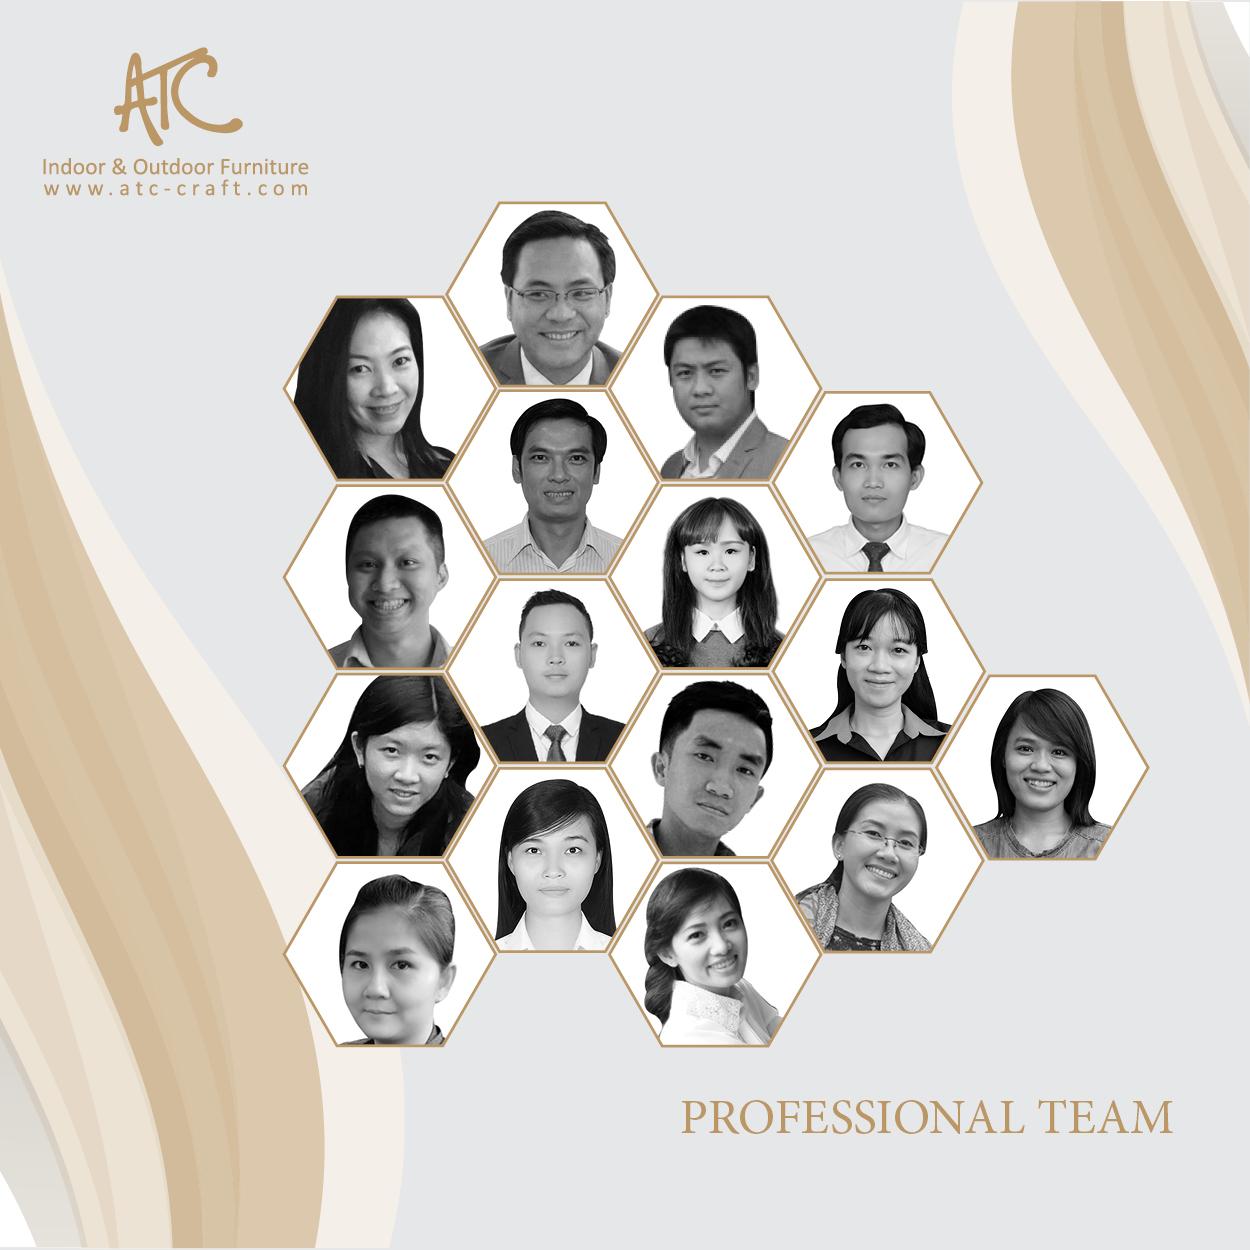 ATC Oudoor Furniture Manufacturer Corp Professional Team Photo